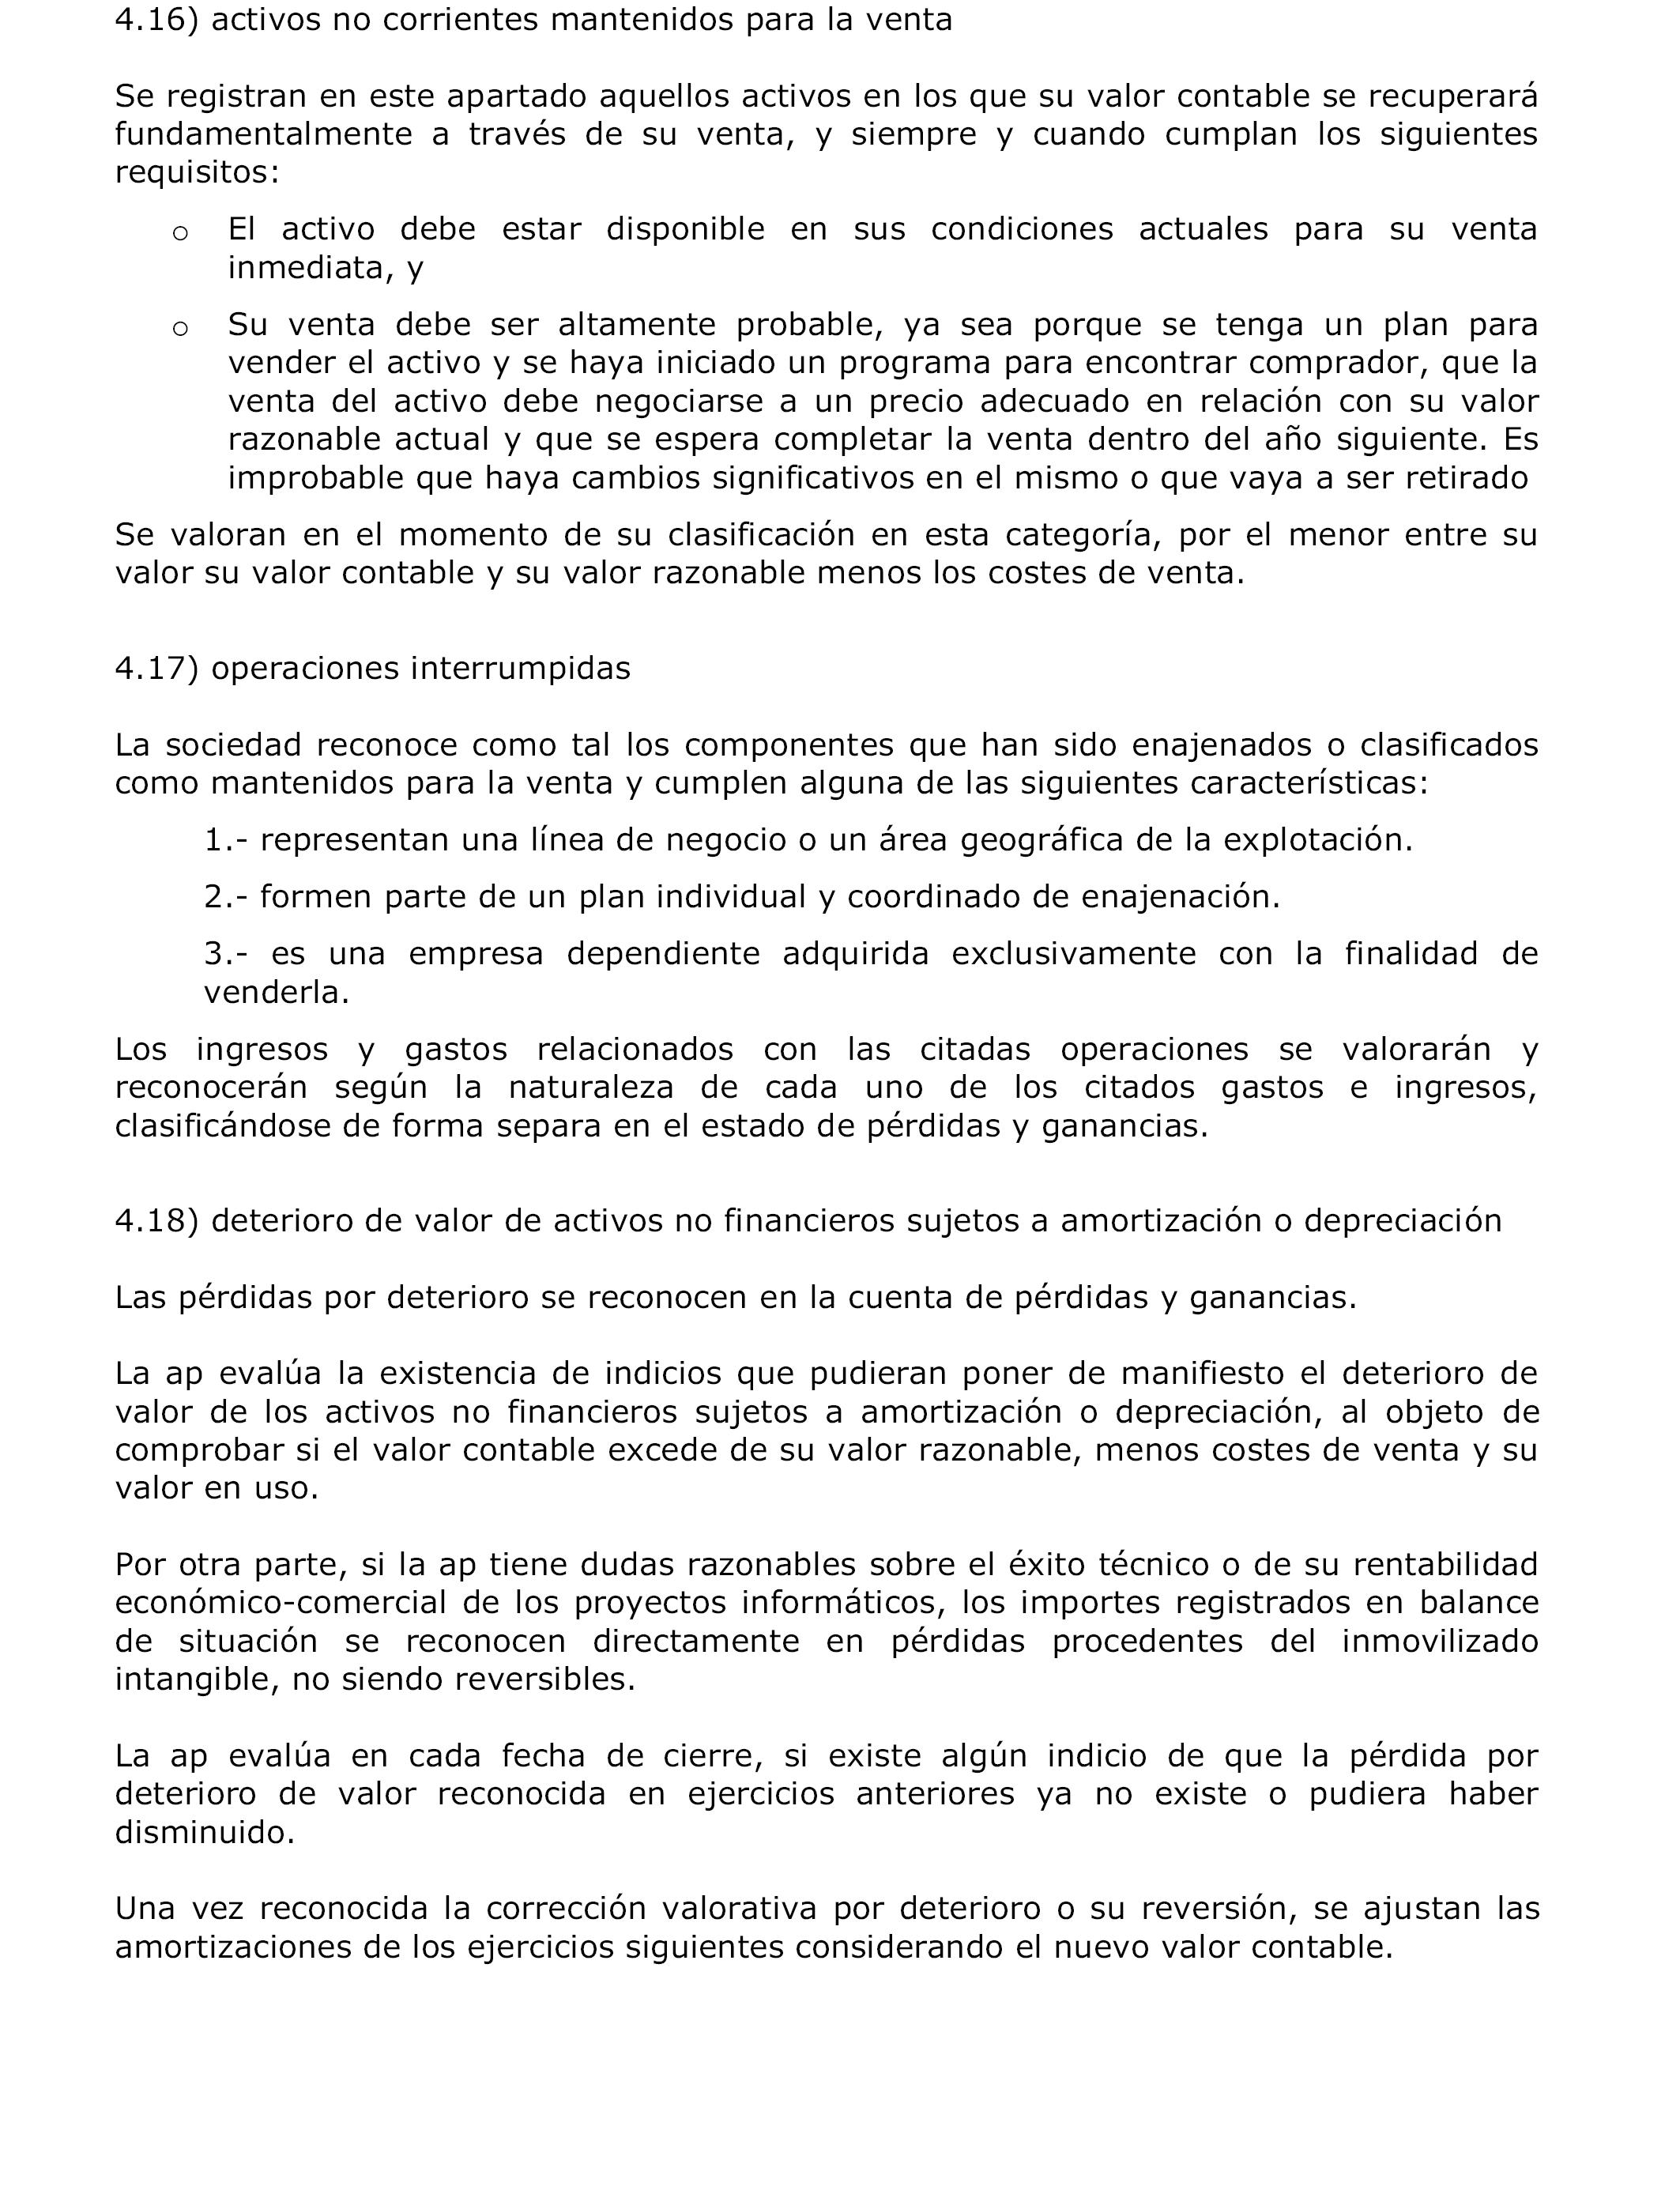 BOE.es - Documento BOE-A-2016-6744